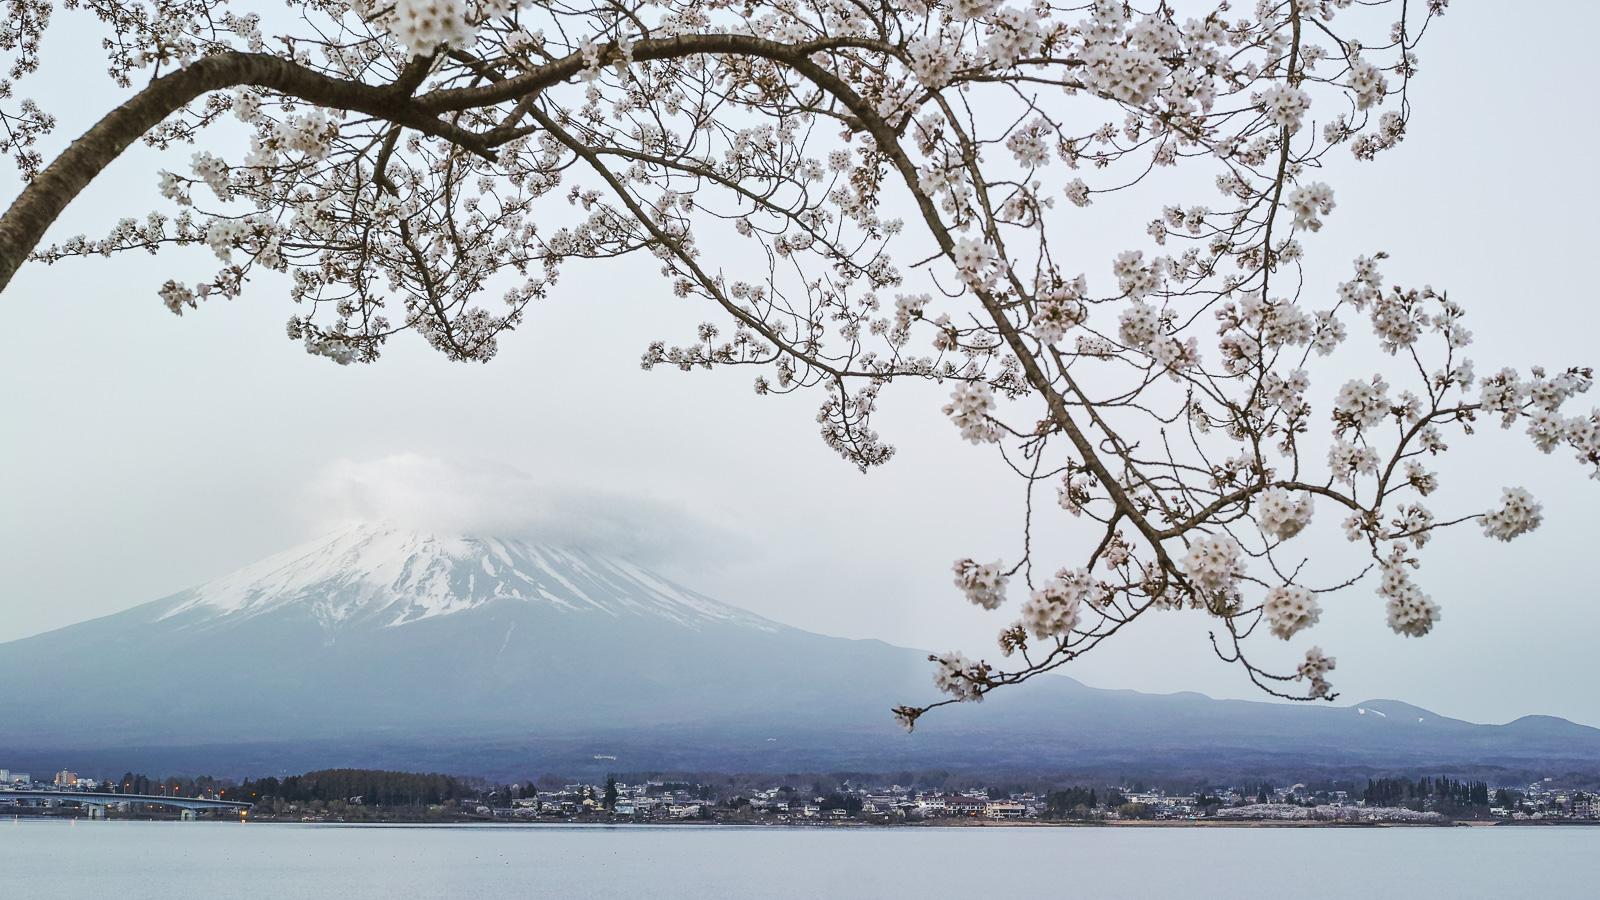 Mt. Fuji - Japan  PHOTOGRAPHY: Giovanni Piliarvu